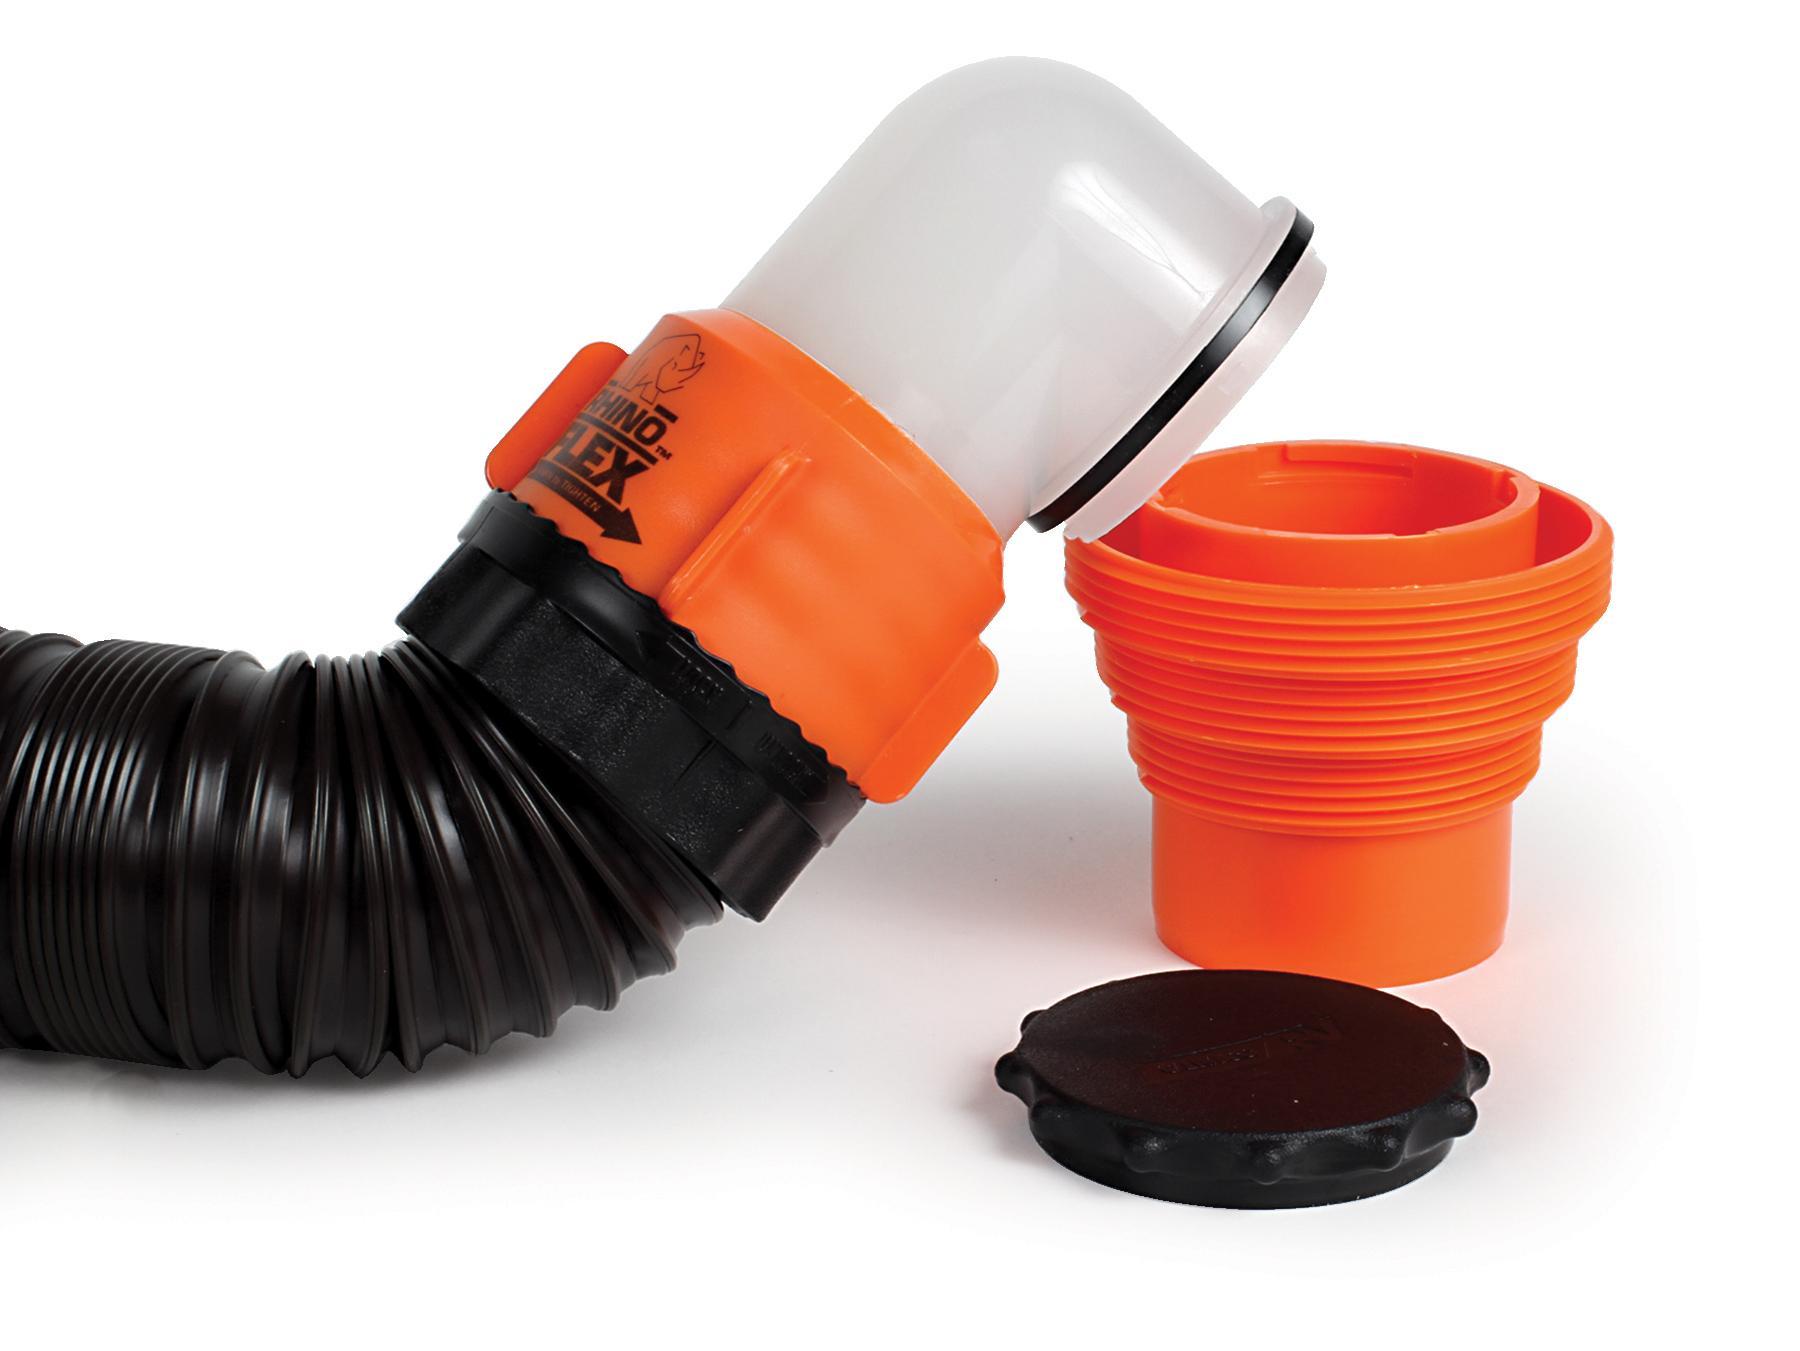 Amazon.com: Camco 39761 RhinoFLEX 15' RV Sewer Hose Kit